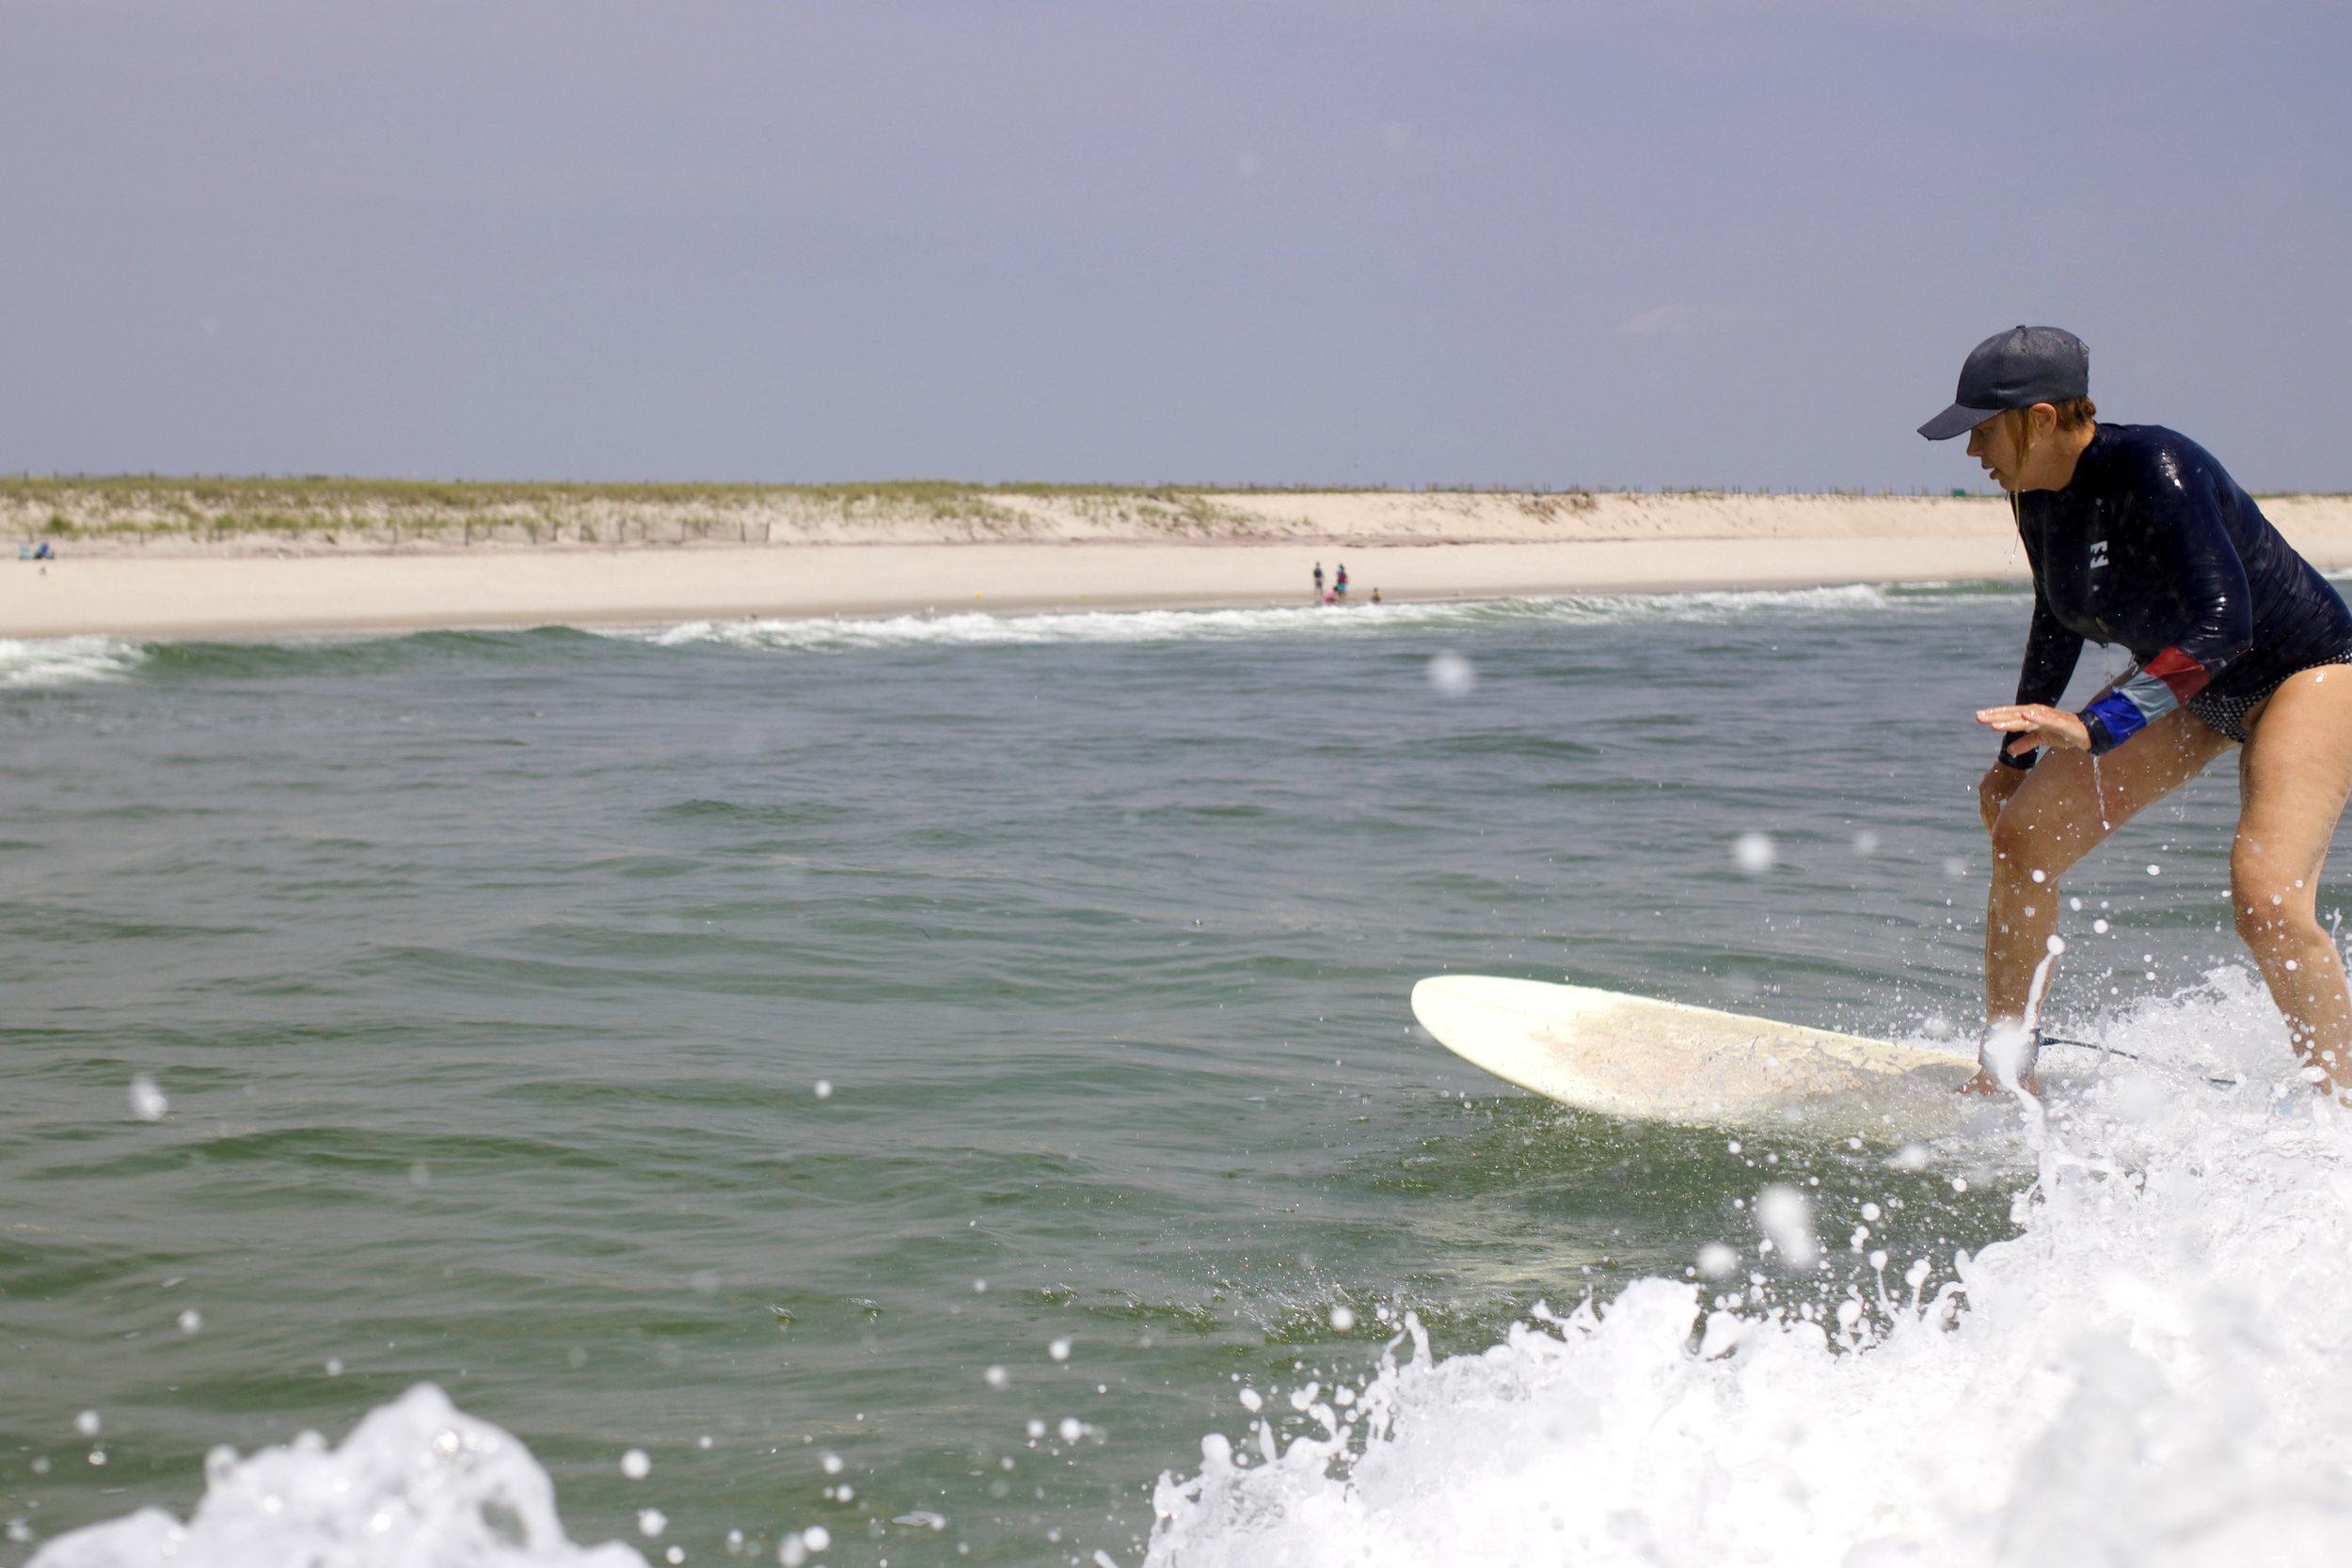 7-22-17 Gilgo Surfer 6.jpg